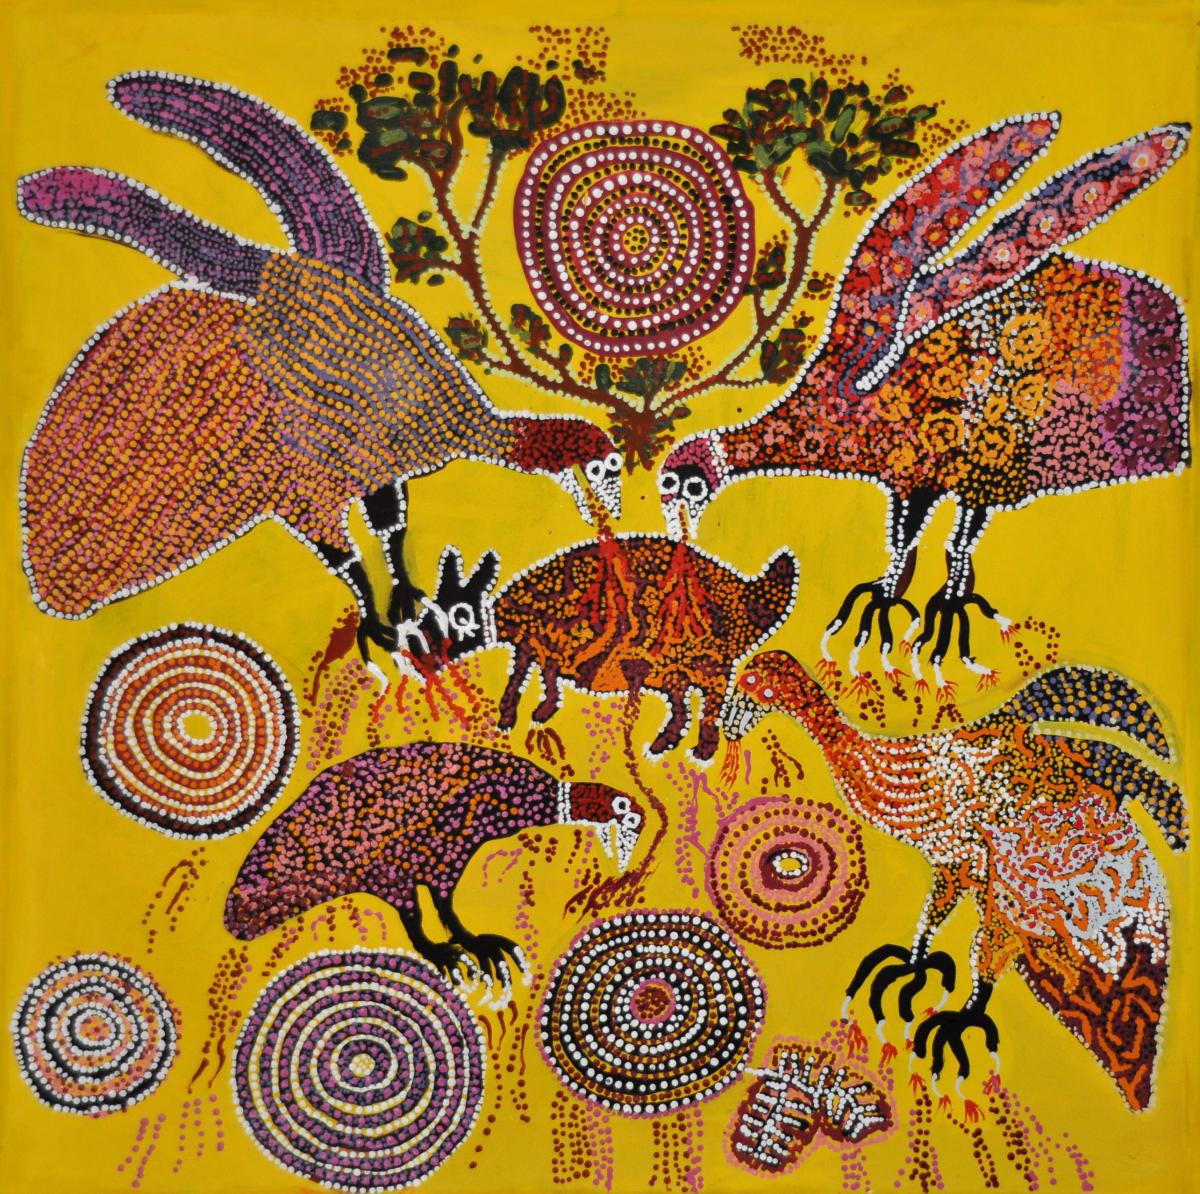 Iluwanti Ken Ngayuku ngura - My Country acrylic on linen 101.5 x 101 cm